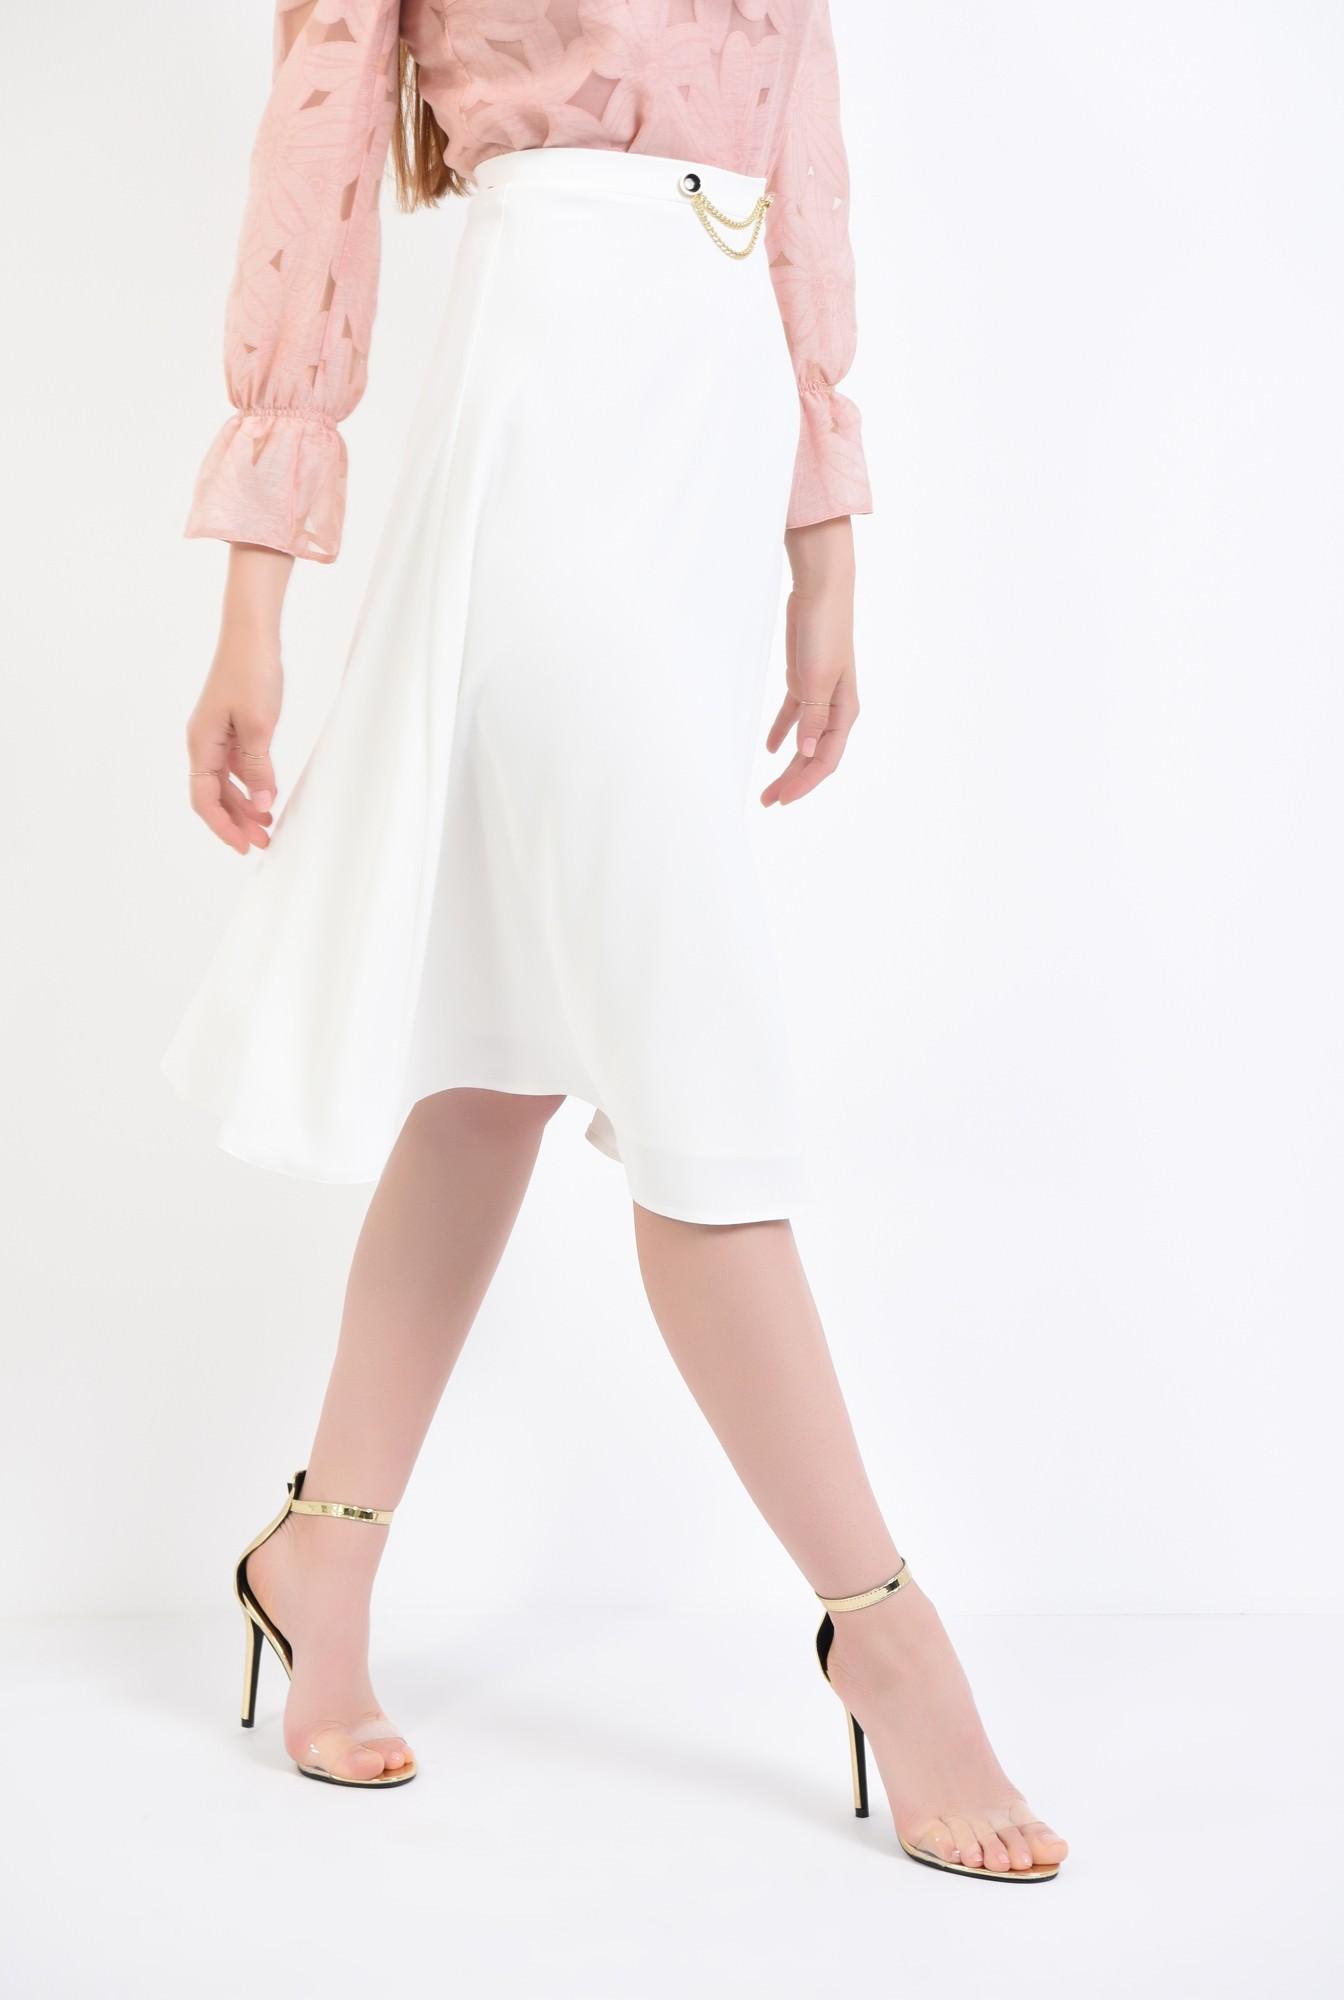 2 - fusta eleganta, alb, midi, cloche